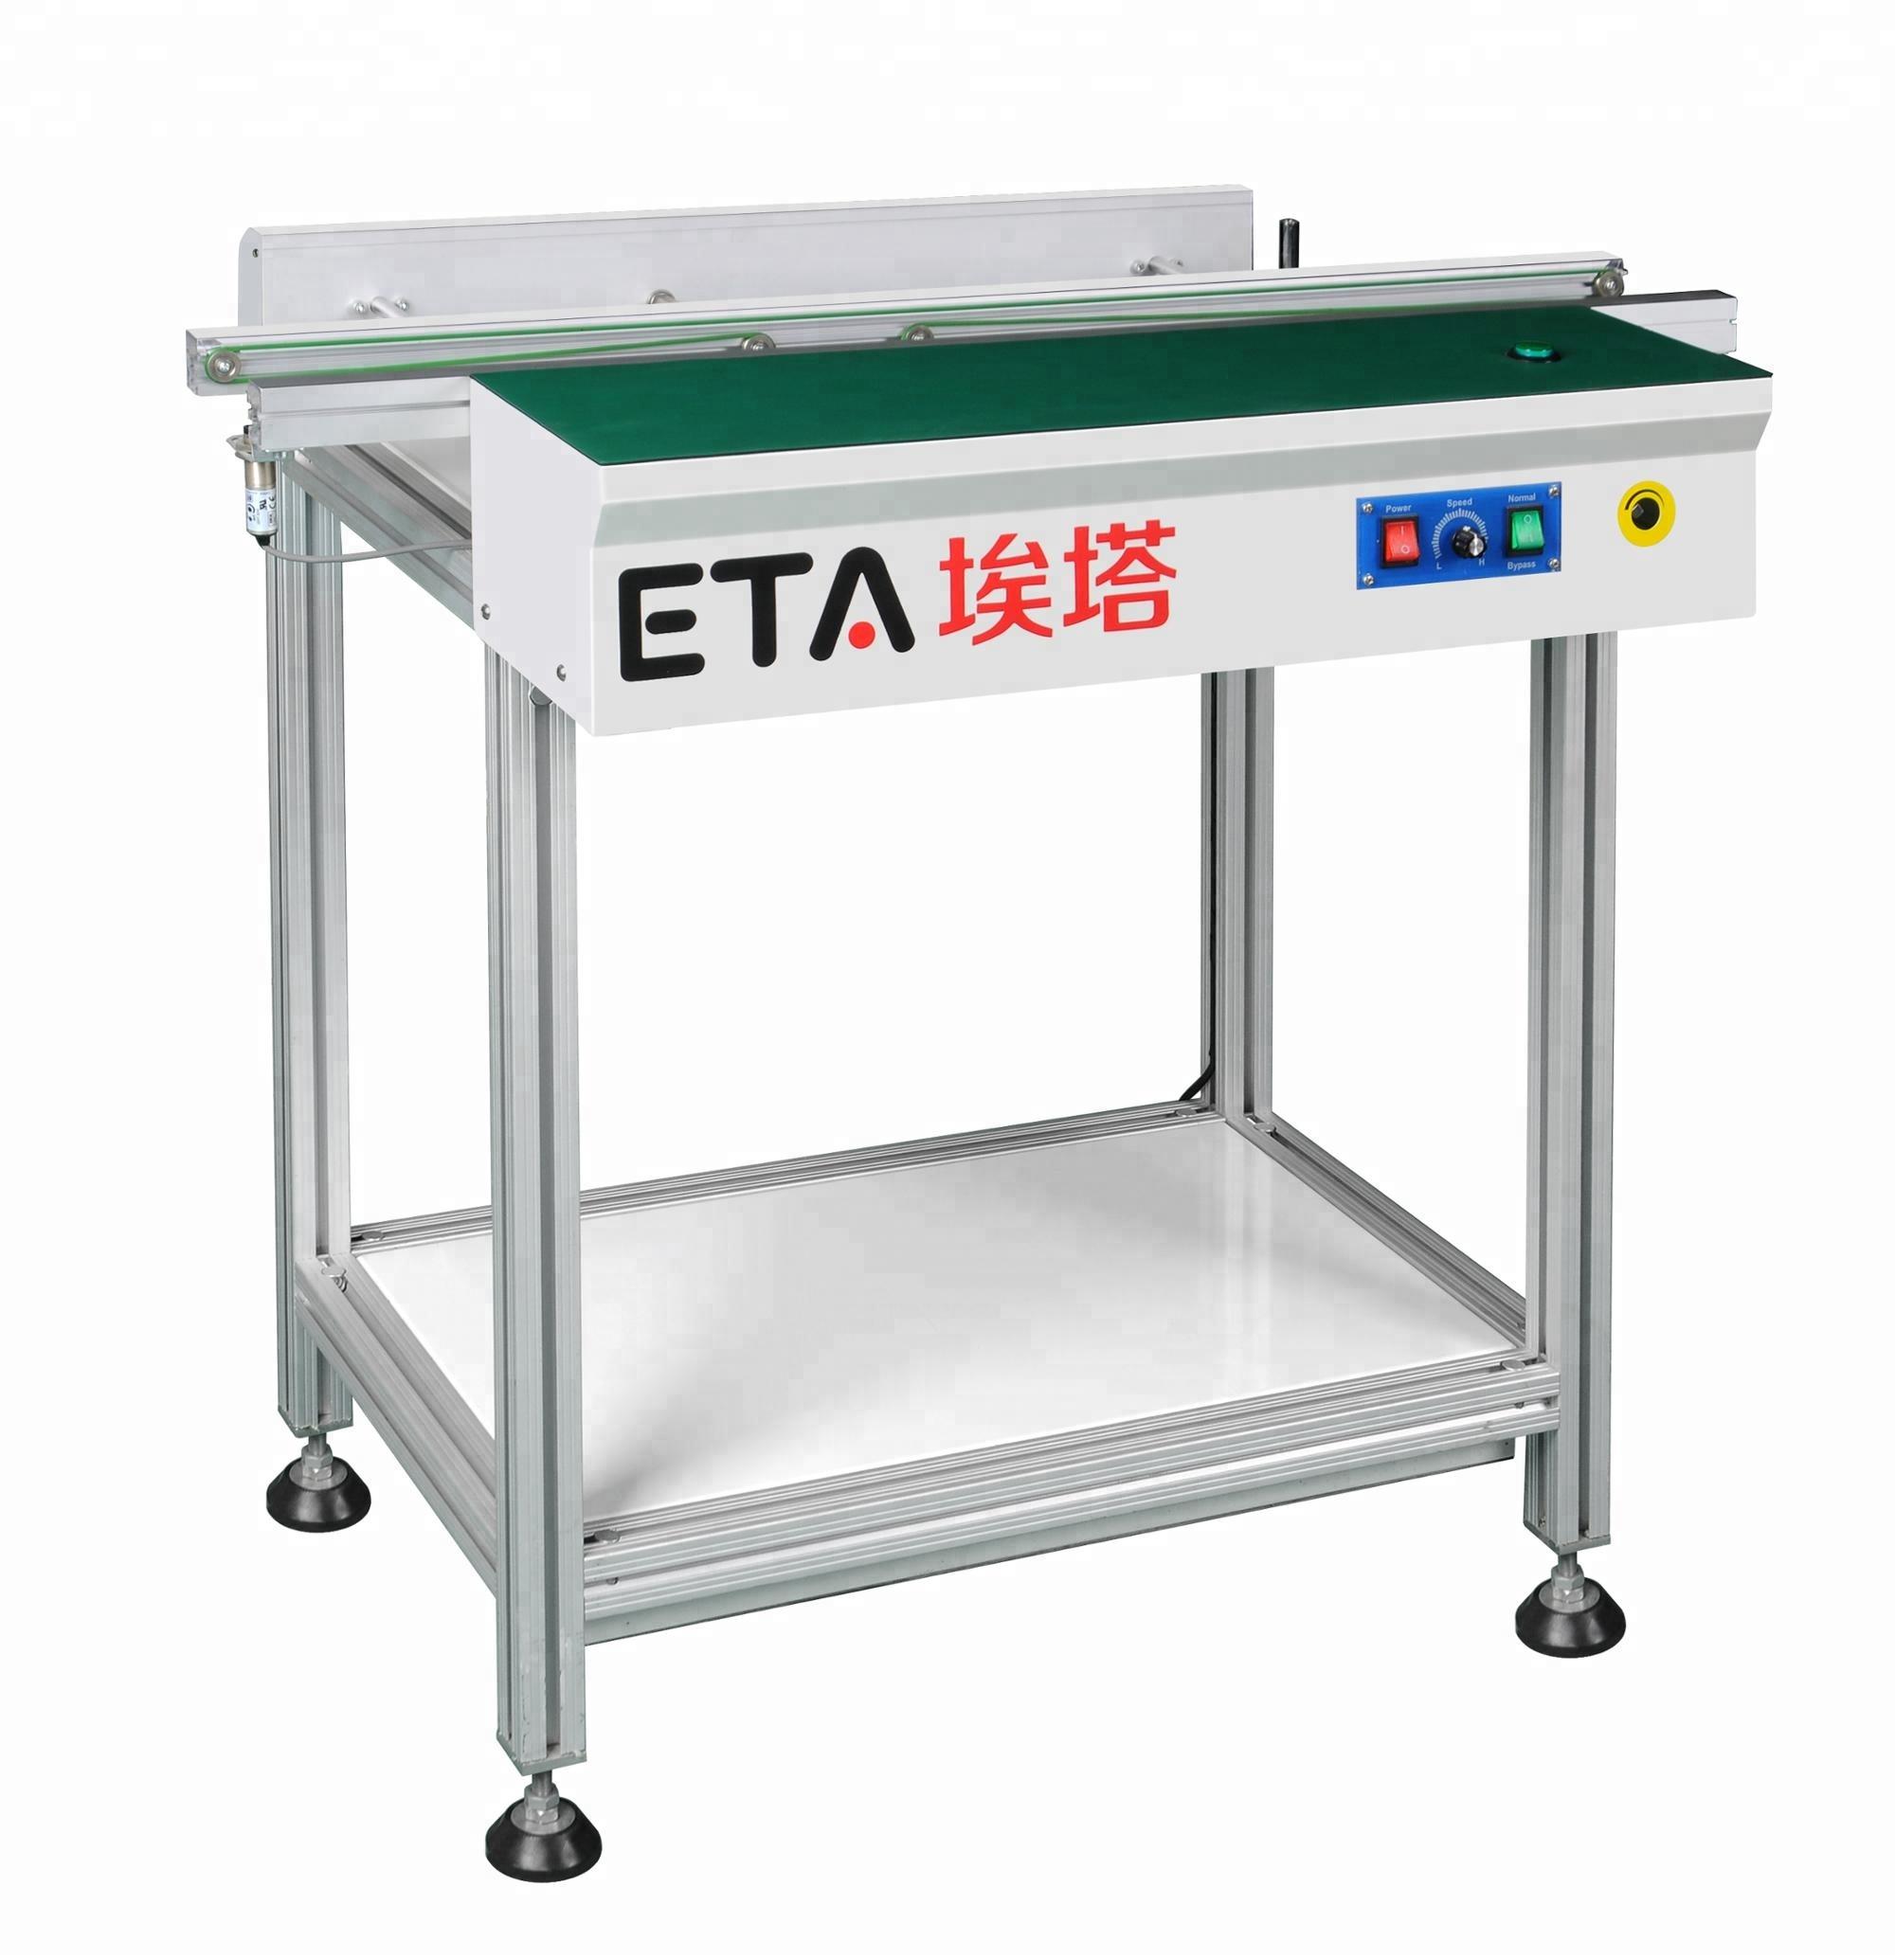 Full-automatic S28 SMT Stacker Conveyor Belt,SMD PCB Flexlink Inspection Conveyor System for Sale